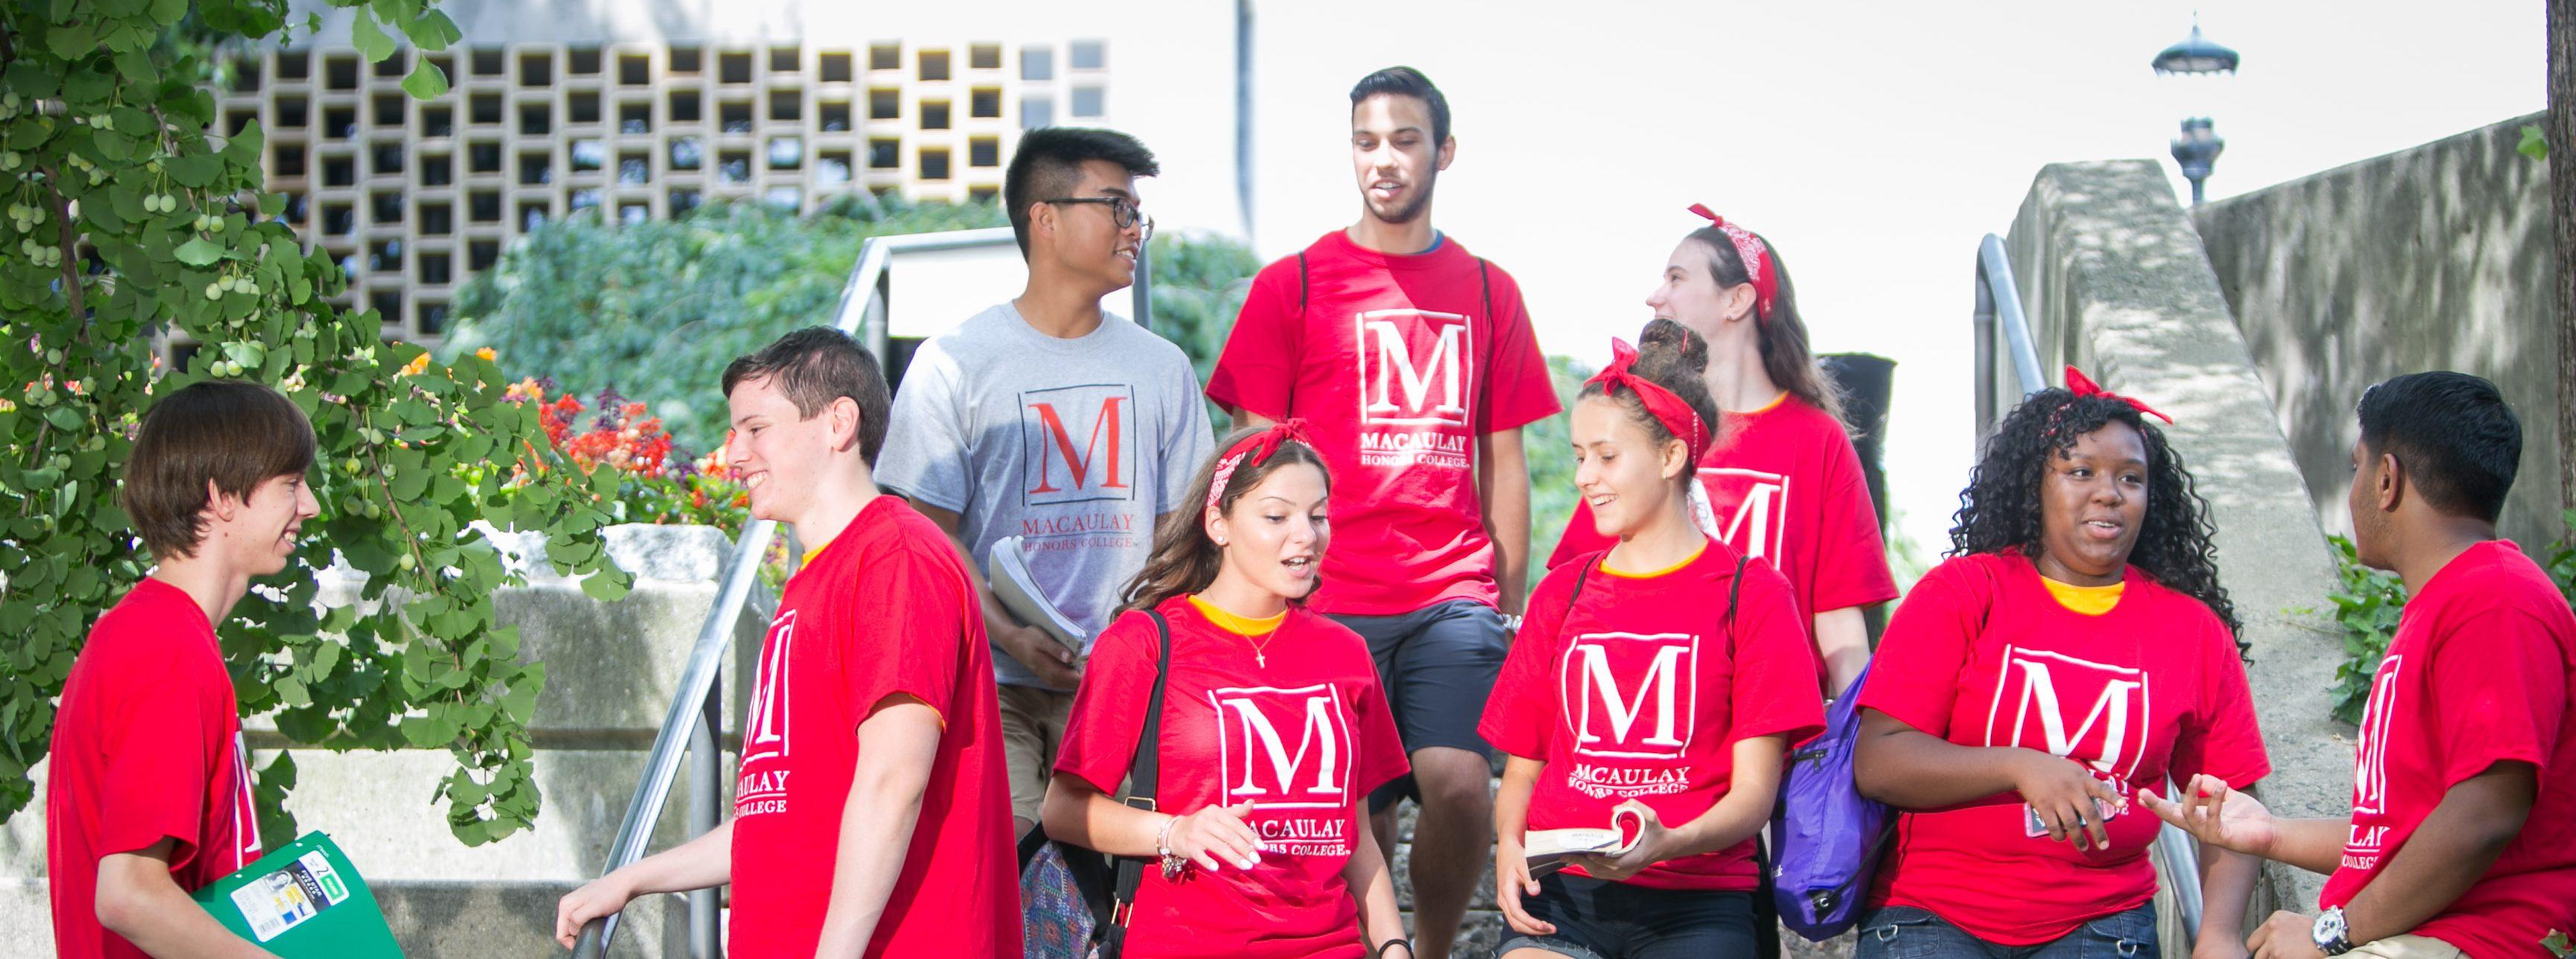 Macaulay Students at Orientation 2015